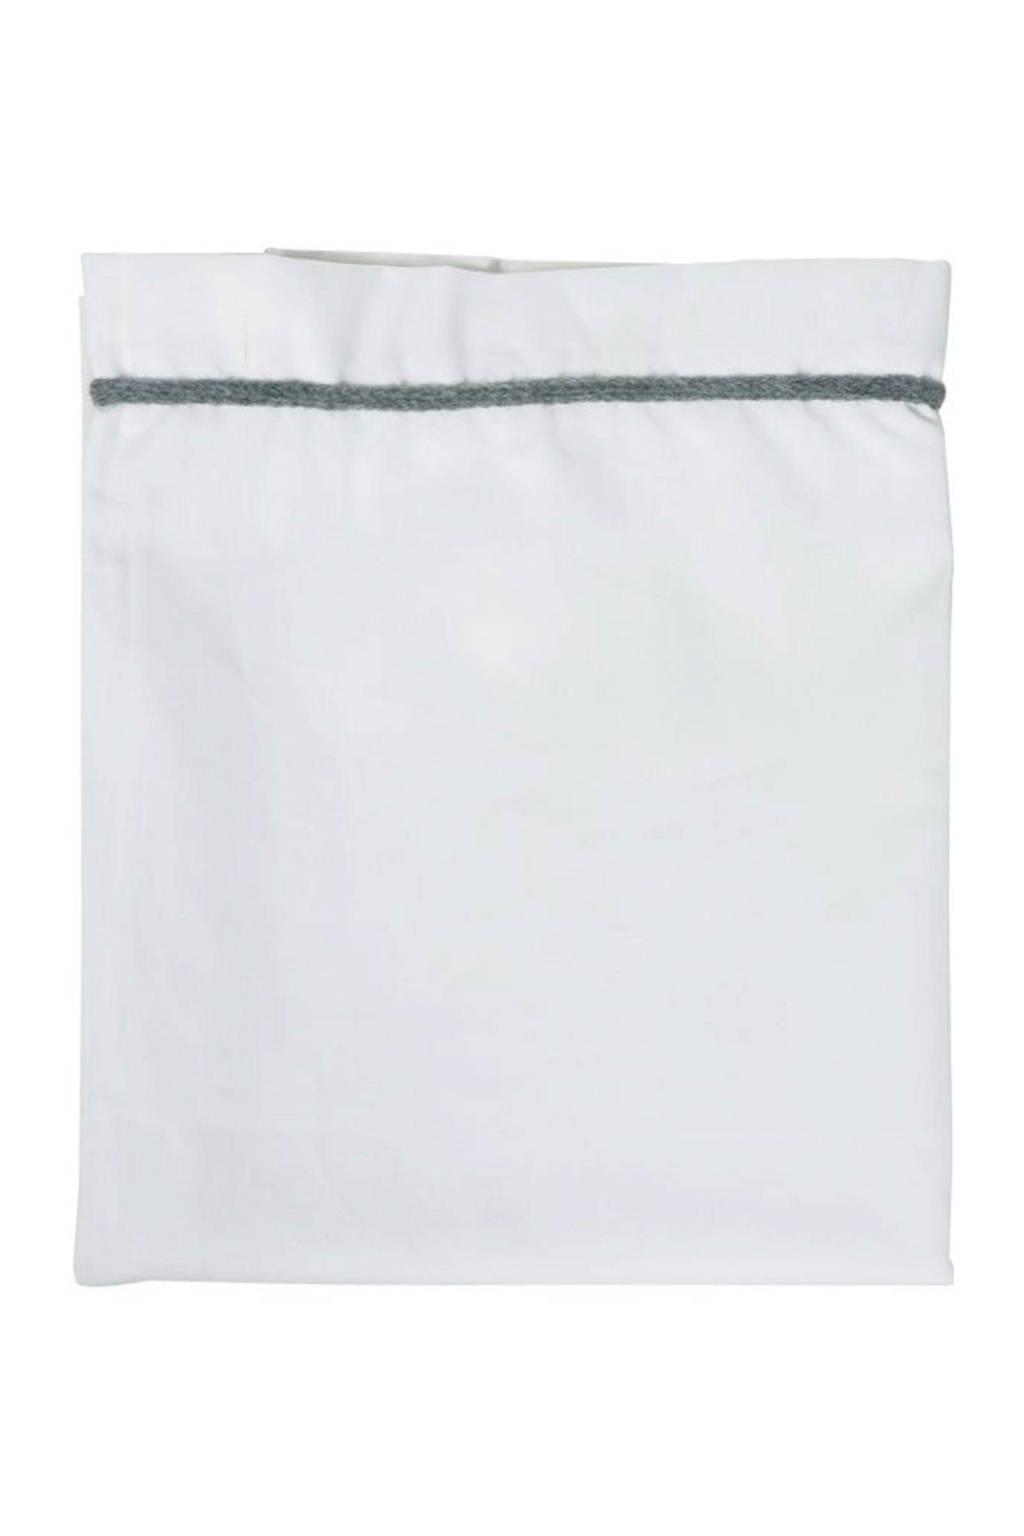 Kidsmill Knitted wieglaken antraciet - 75x100 cm, Antraciet